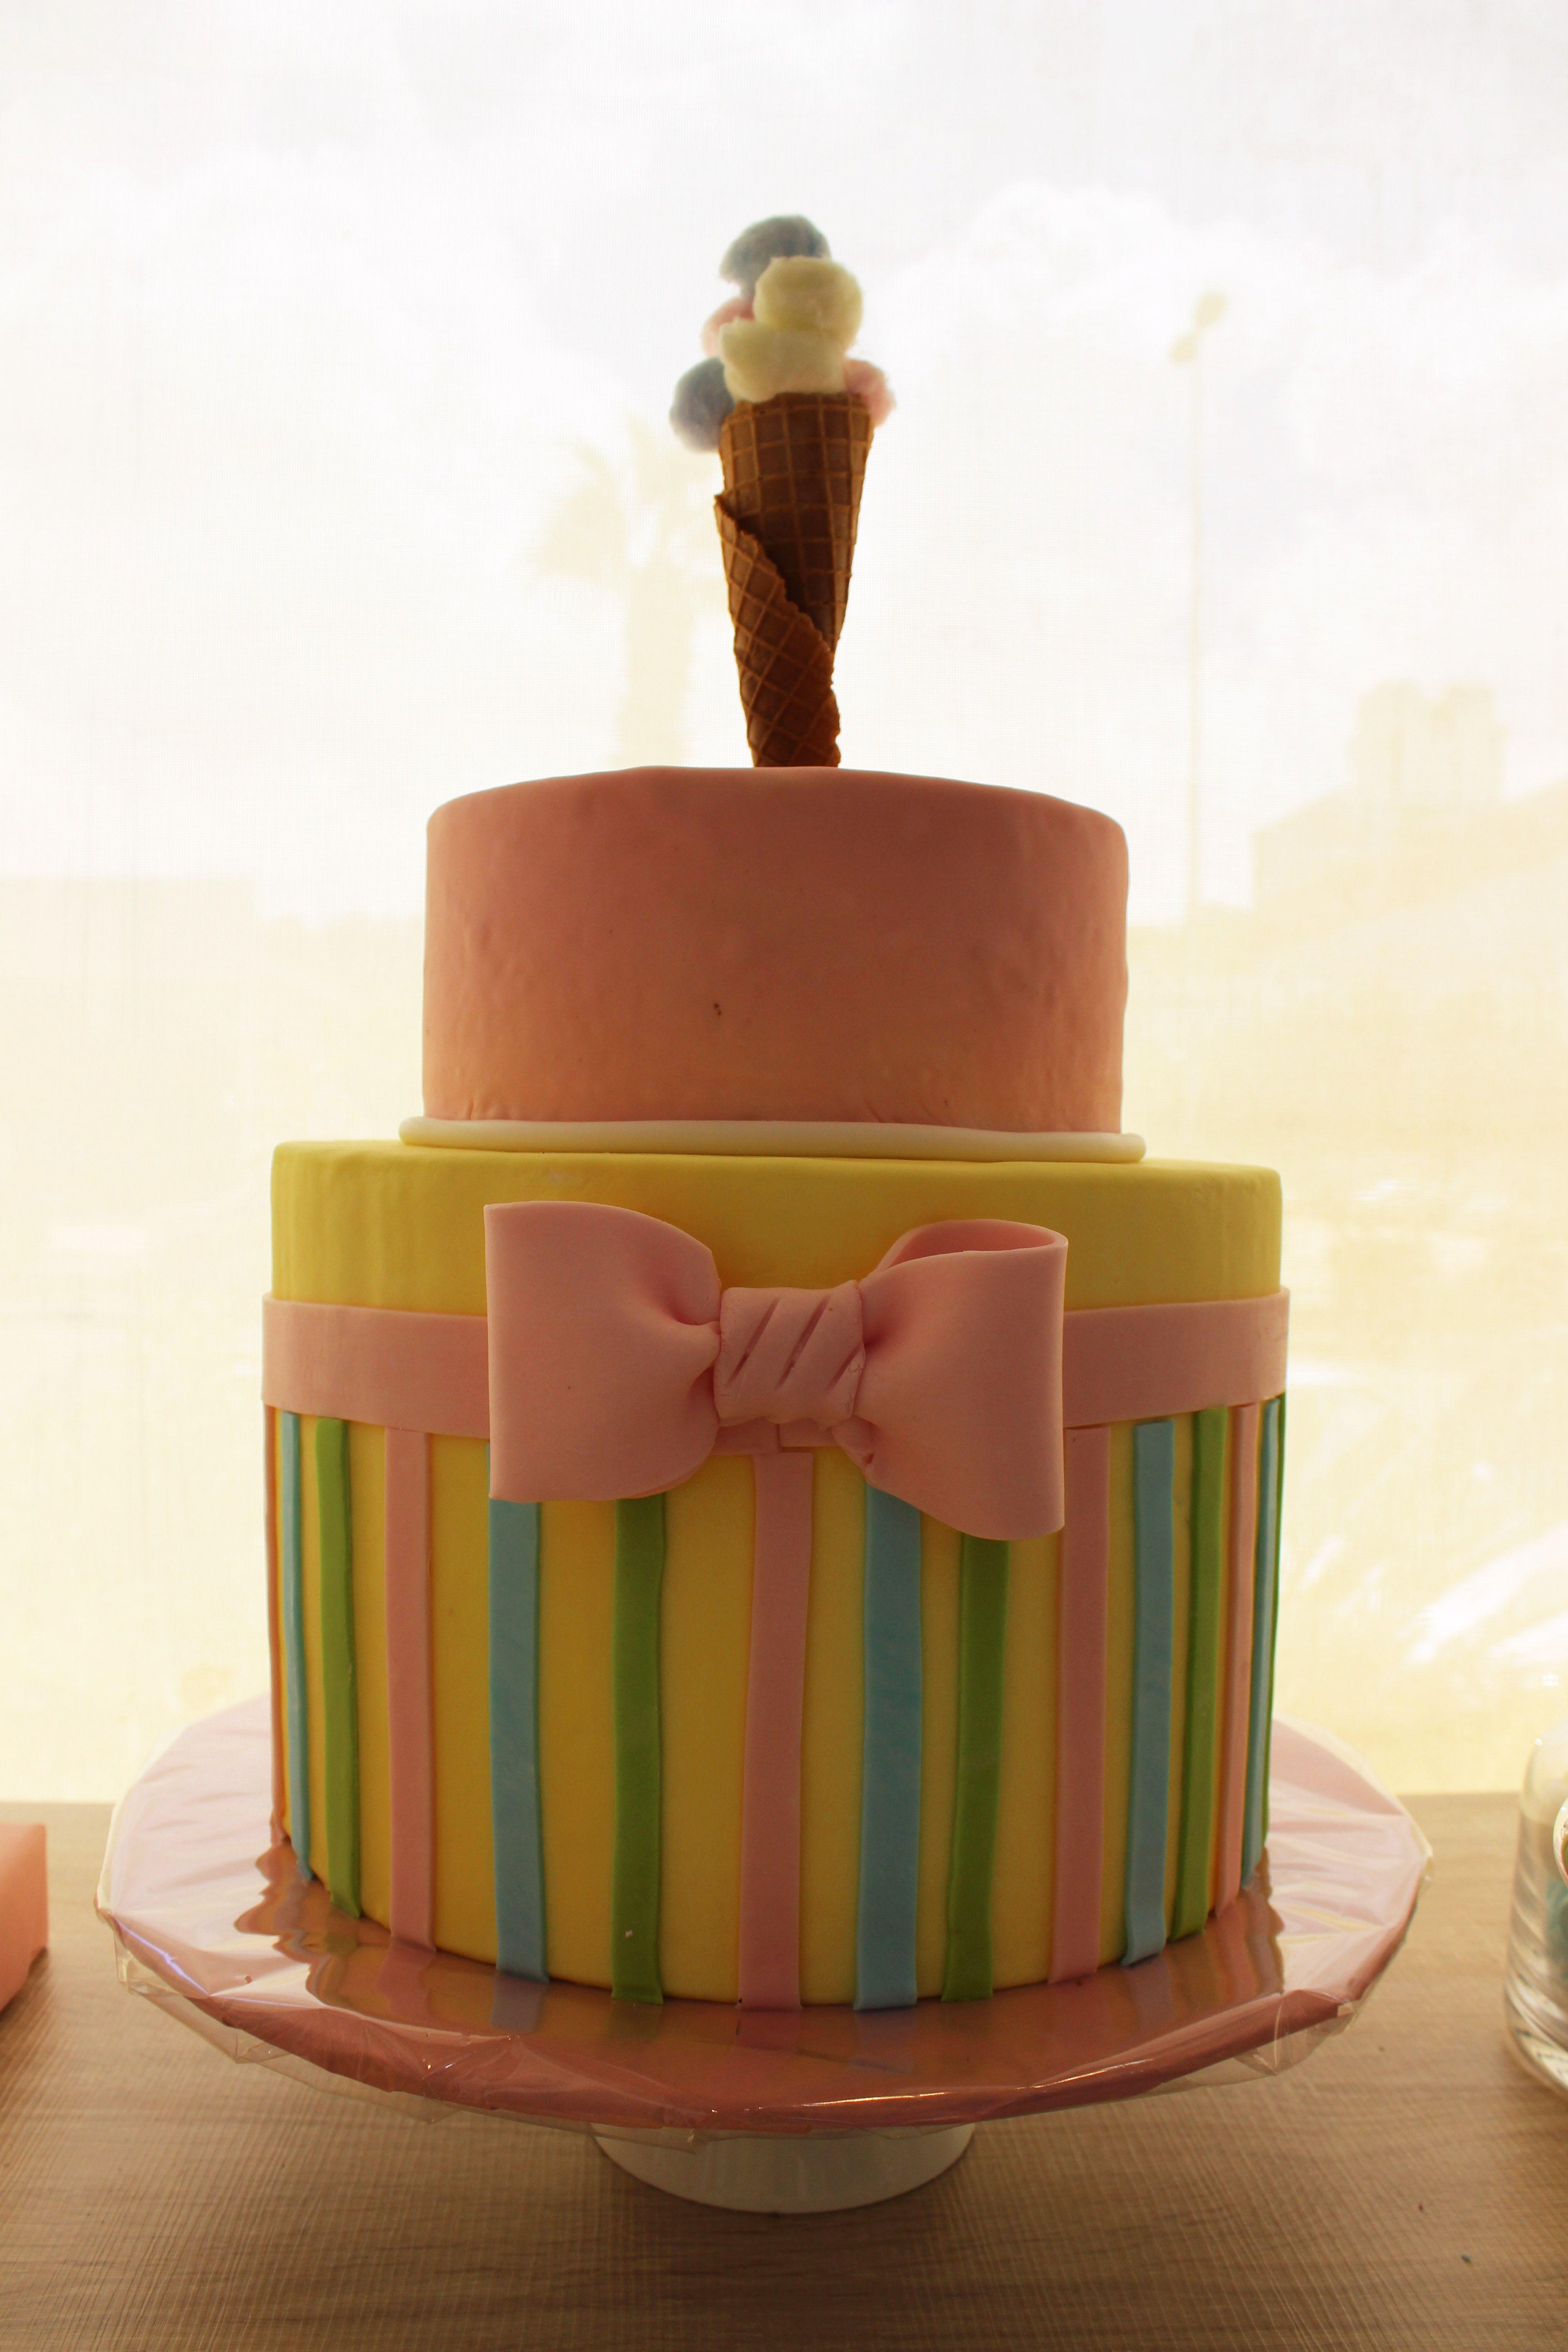 #Cake #icecream #Albabasweets